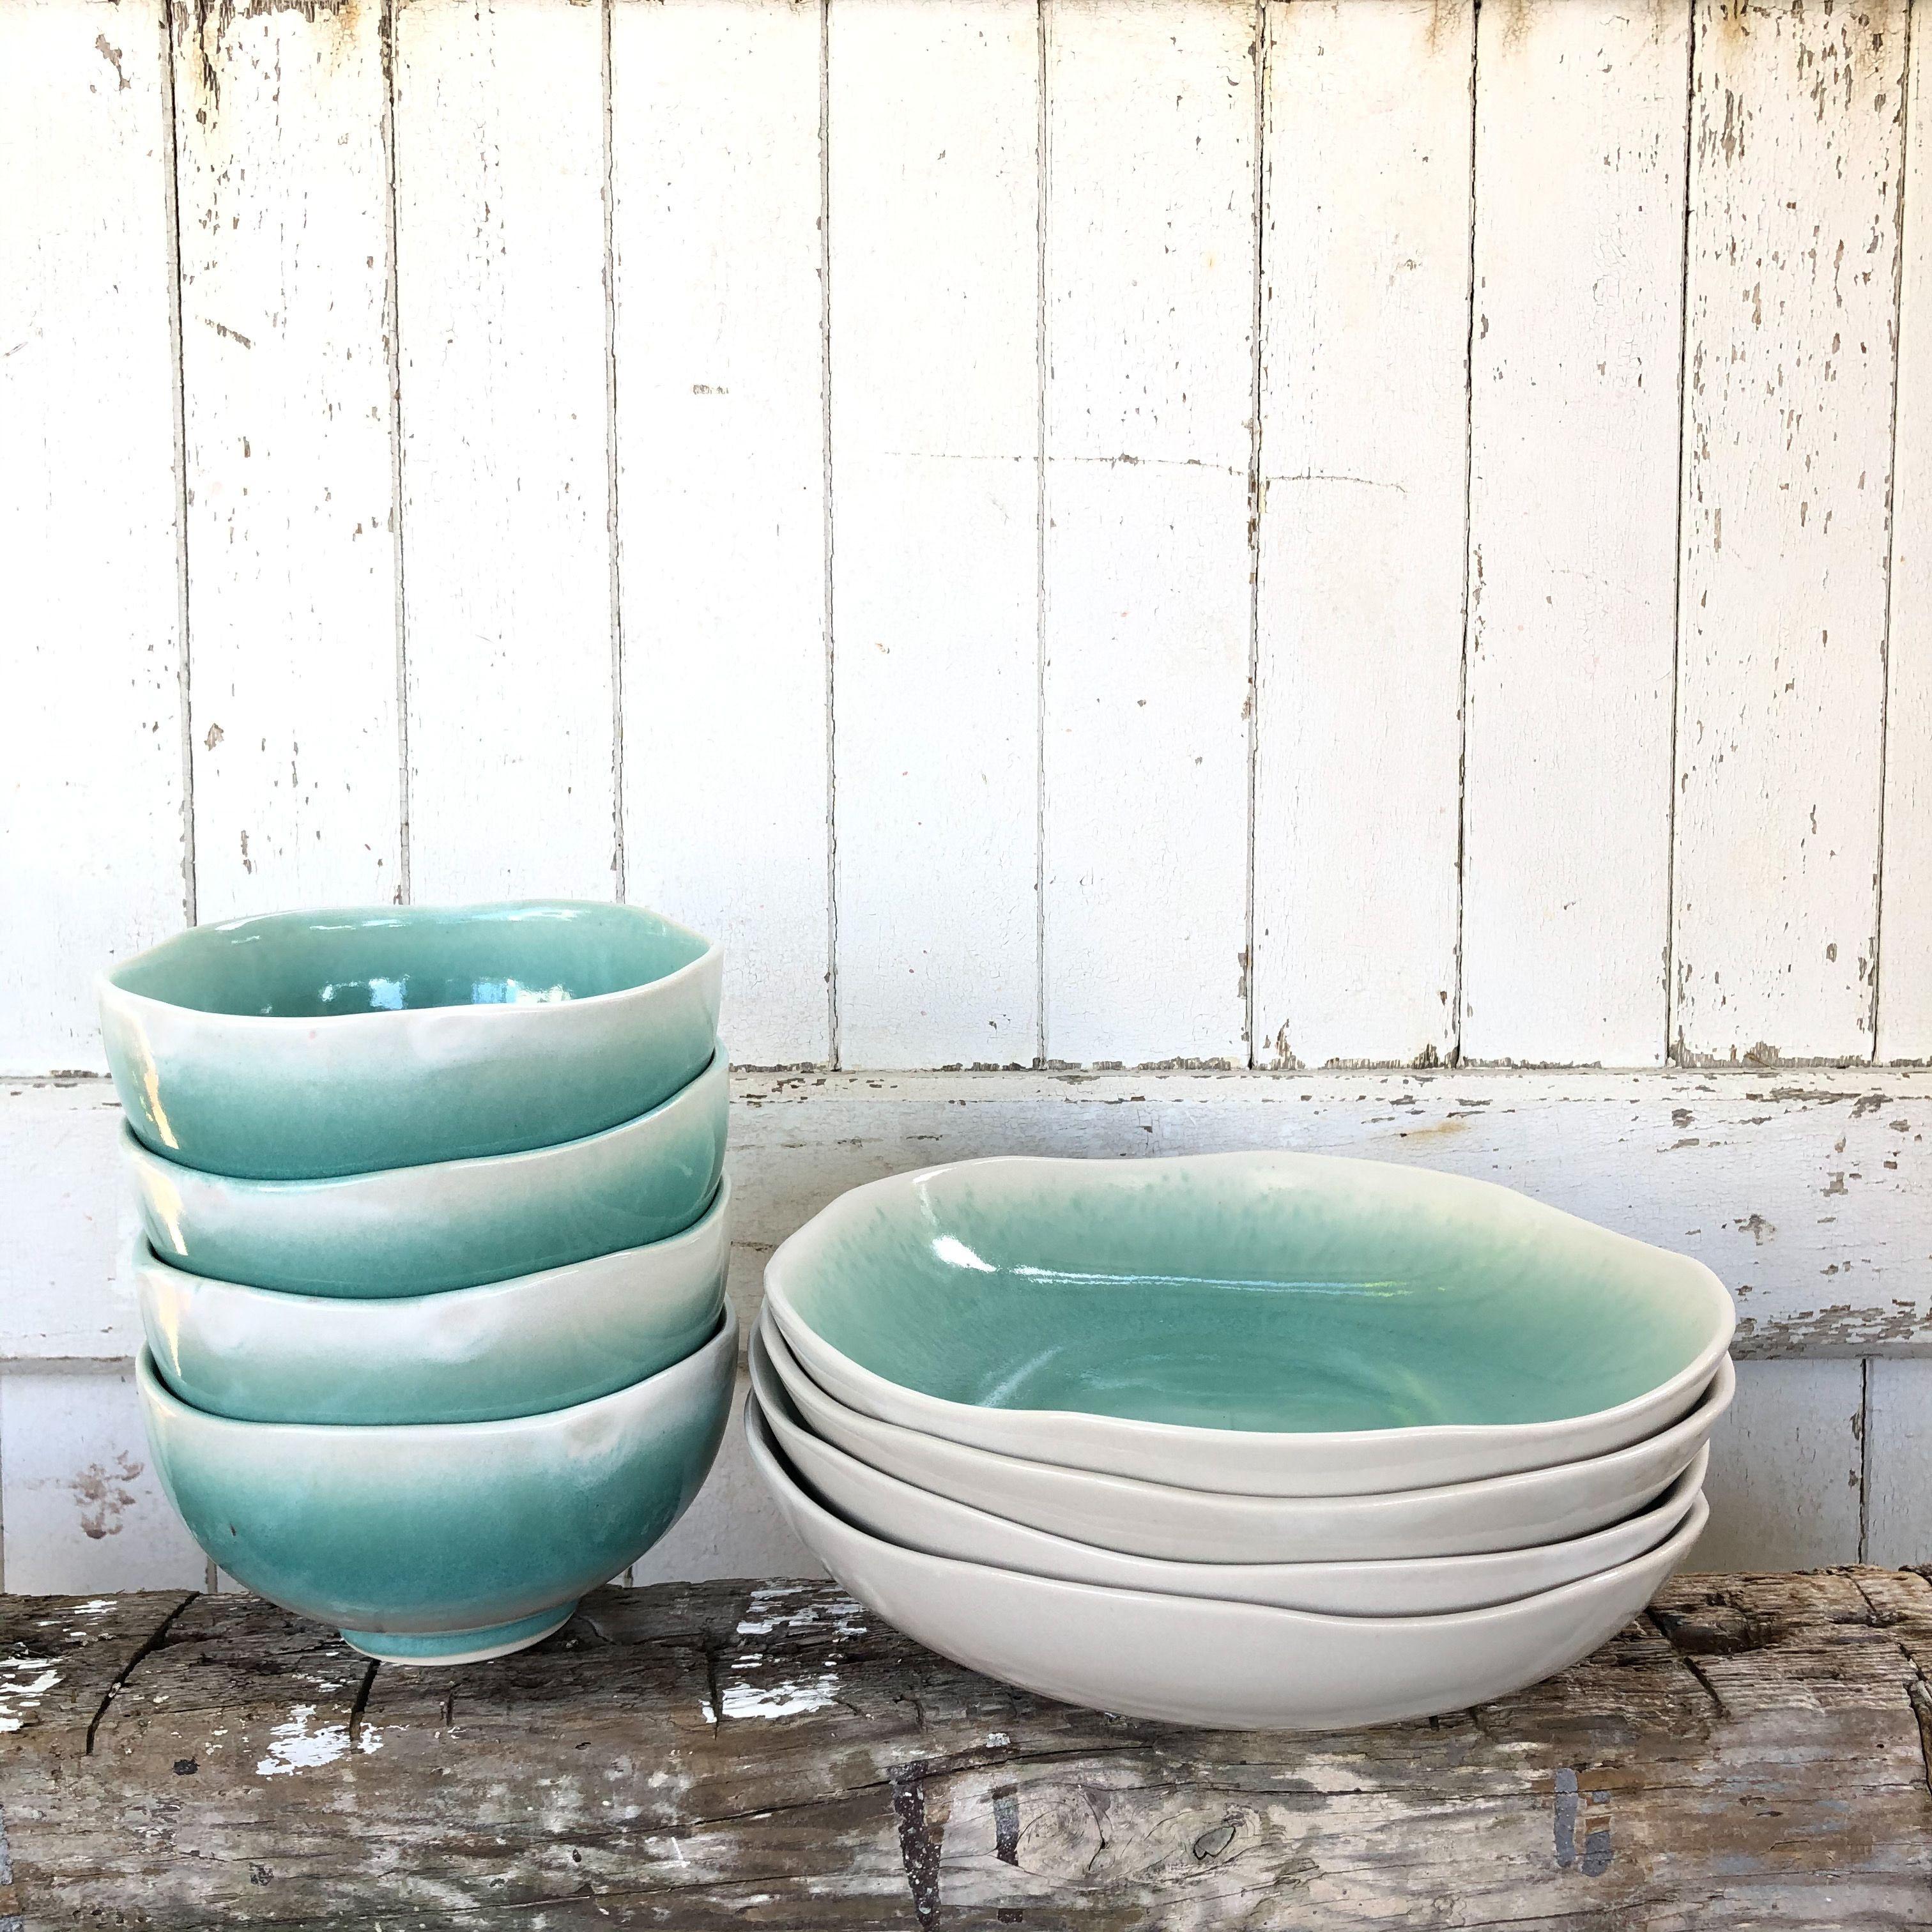 The 'Glacier' 8 Piece Tableware Set by Pottery For The Planet. #tablewarecollection #ceramictablewareset #potterydesign #potterytableware #earthenwarepotterytableware #potterystudio